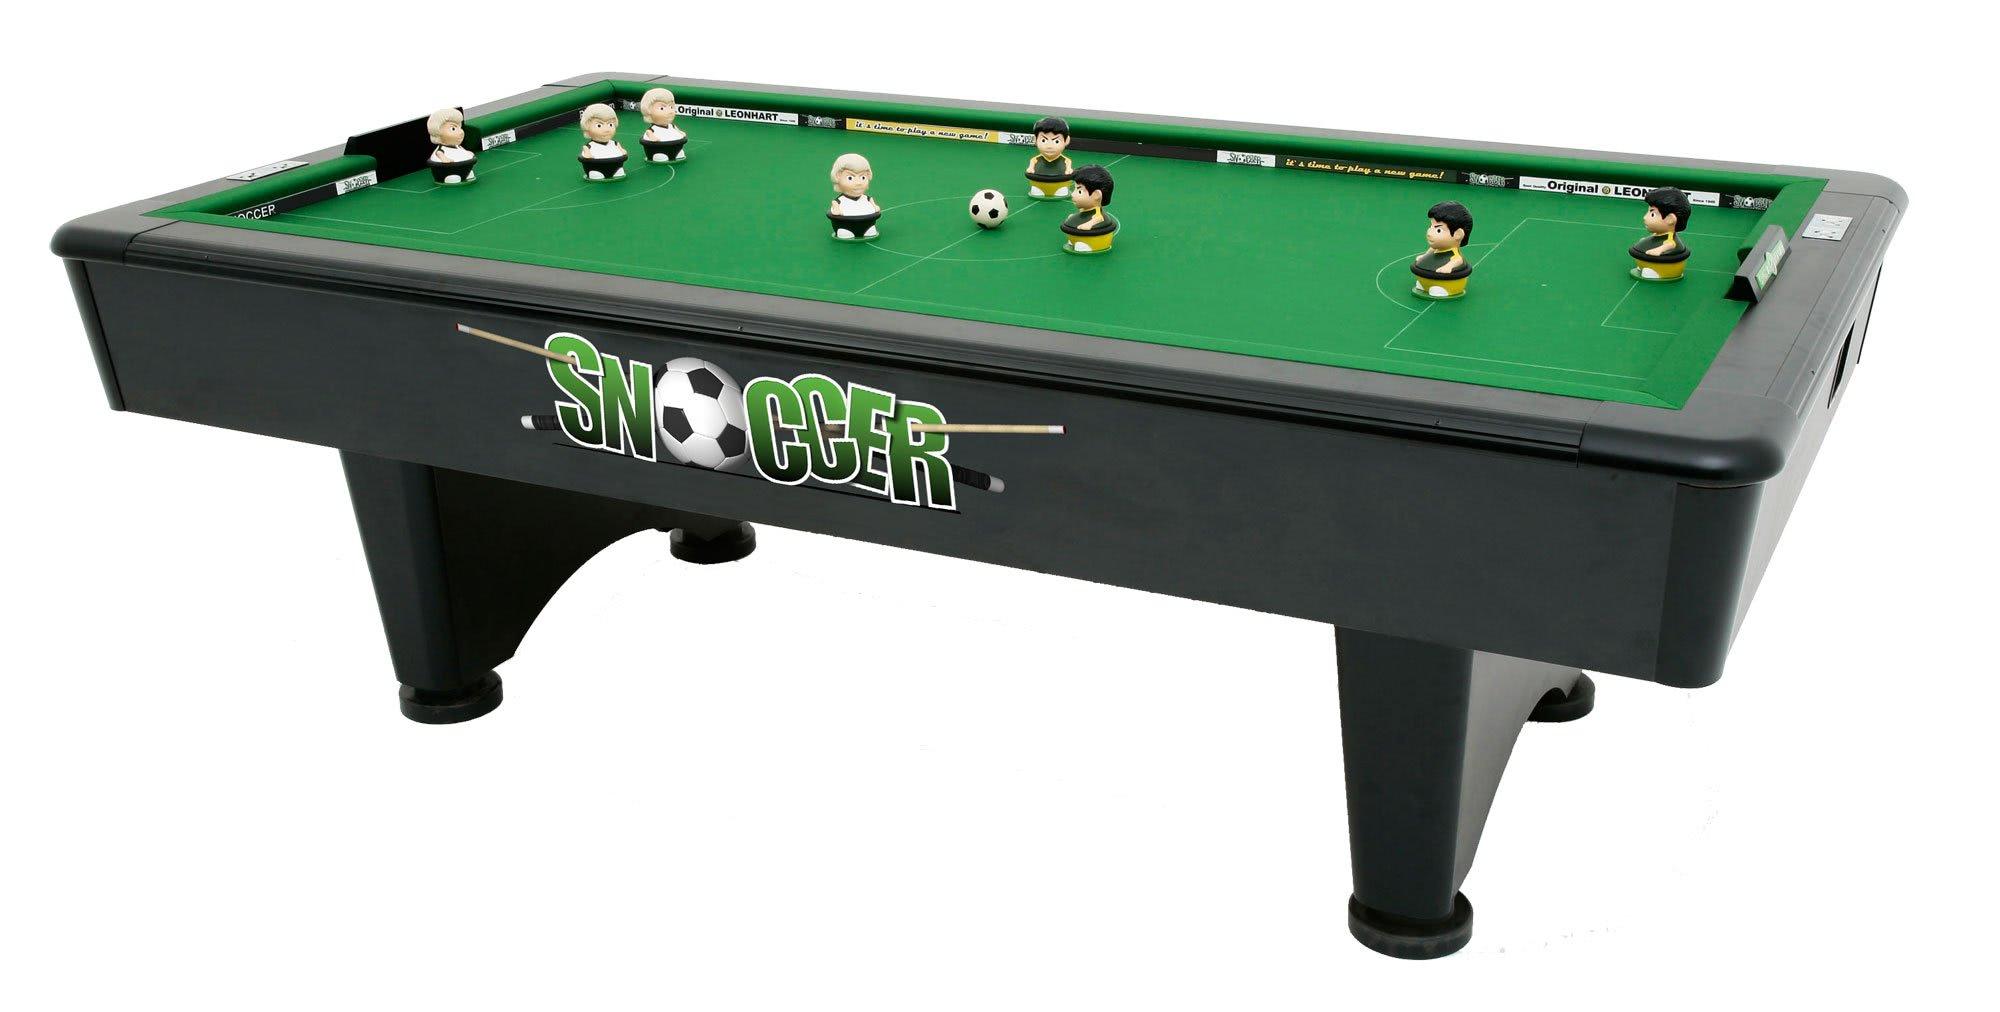 Snoccer Snooker & Soccer bination Game Table